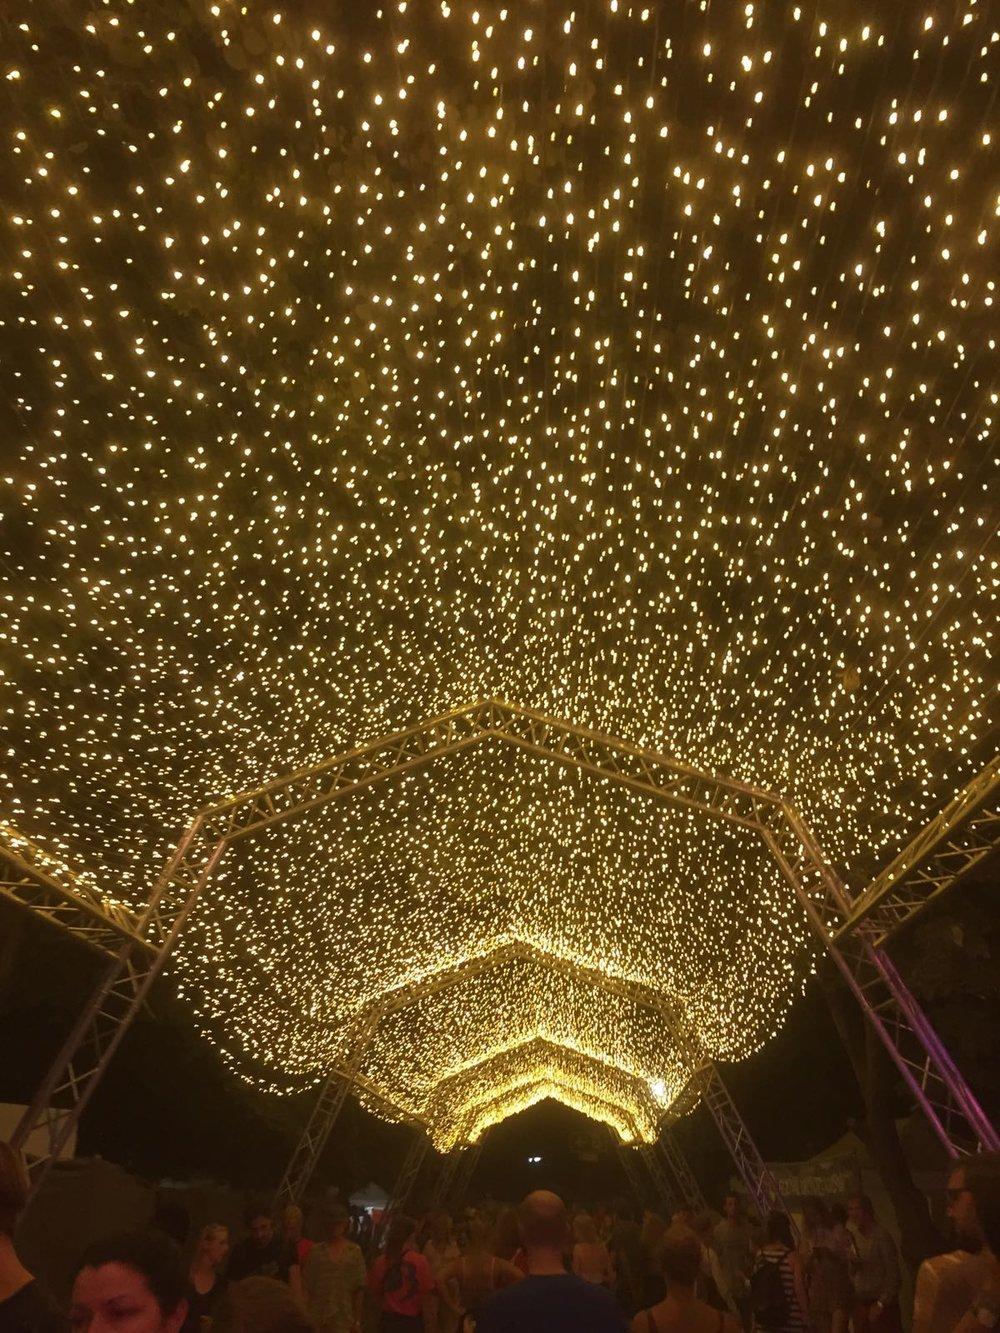 night_sky_fairy_lights.jpg